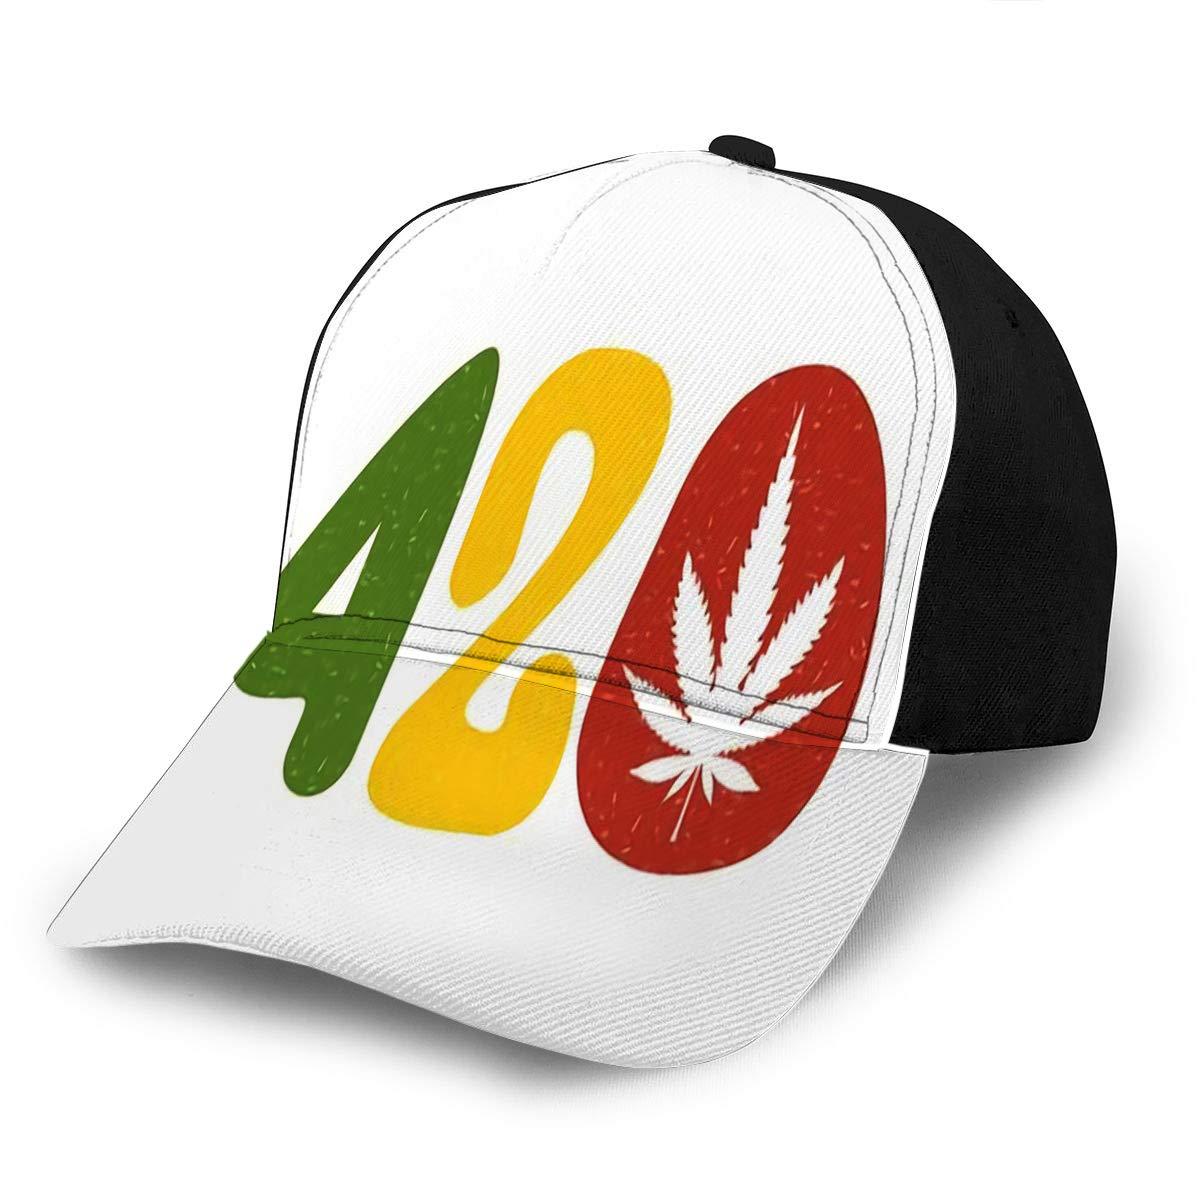 Baseball Cap Hats Snapback Color Text 420 with Cannabis Leaf Fits Men Women Boy